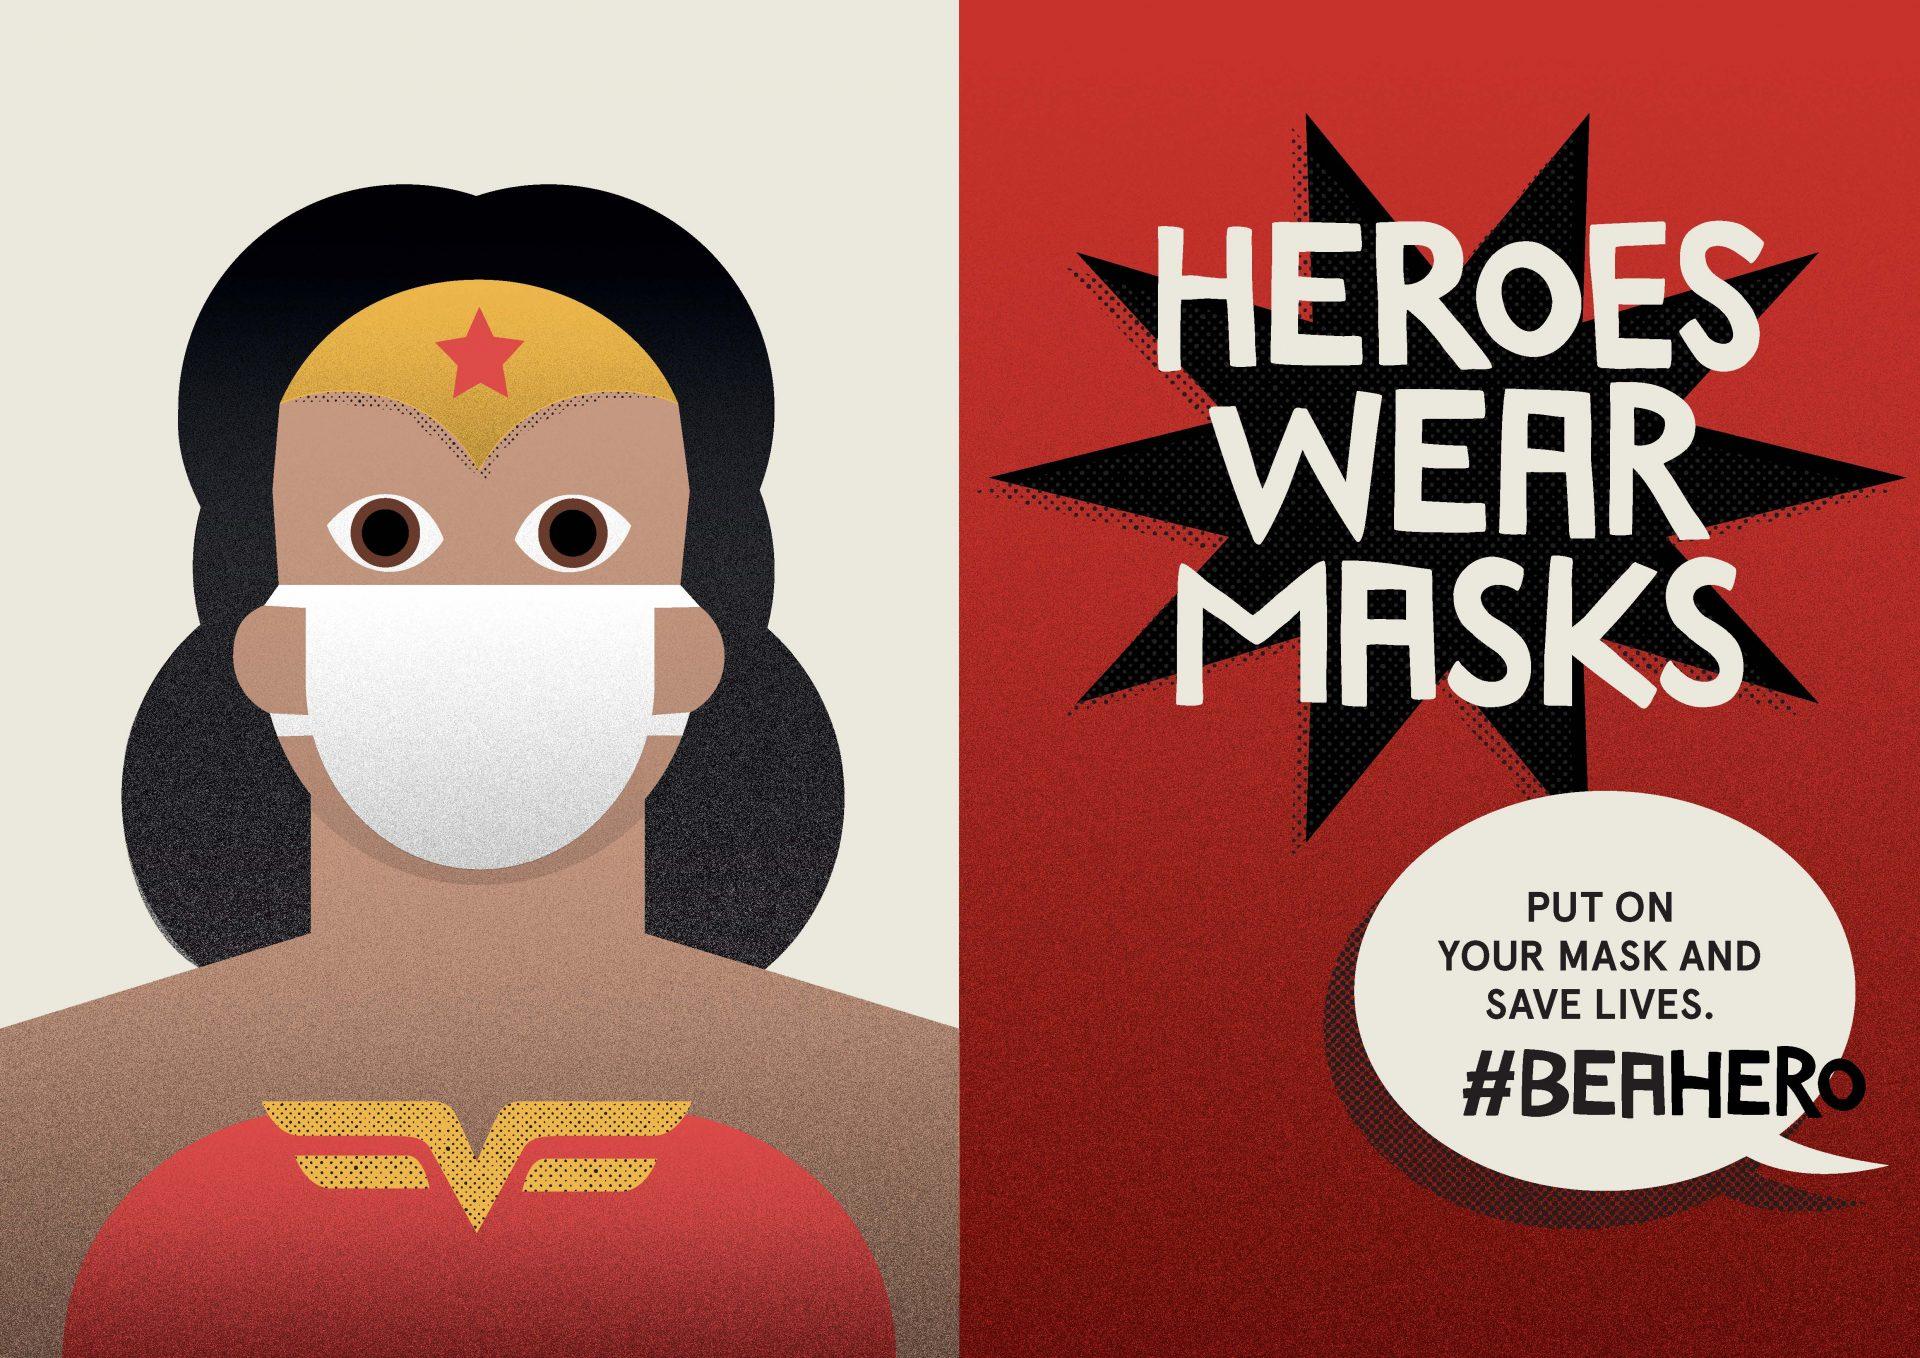 Heroes wear masks. Wonder woman.